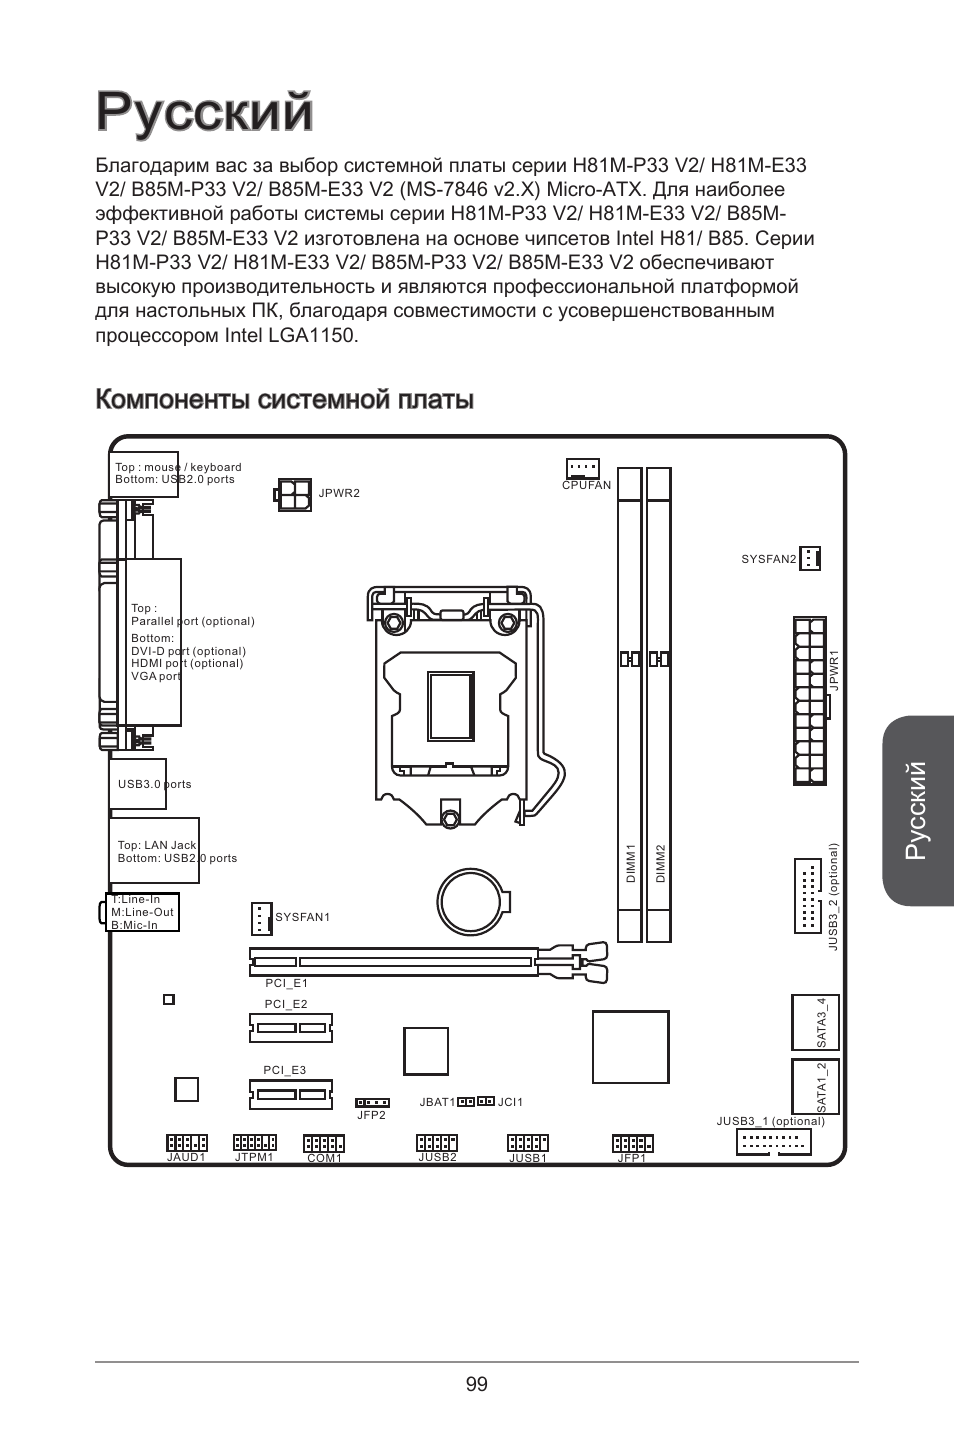 Msi Wiring Diagram Schematics Diagrams Brz Fujitsu H81m E33 Free Download U2022 Oasis Dl Co Mci